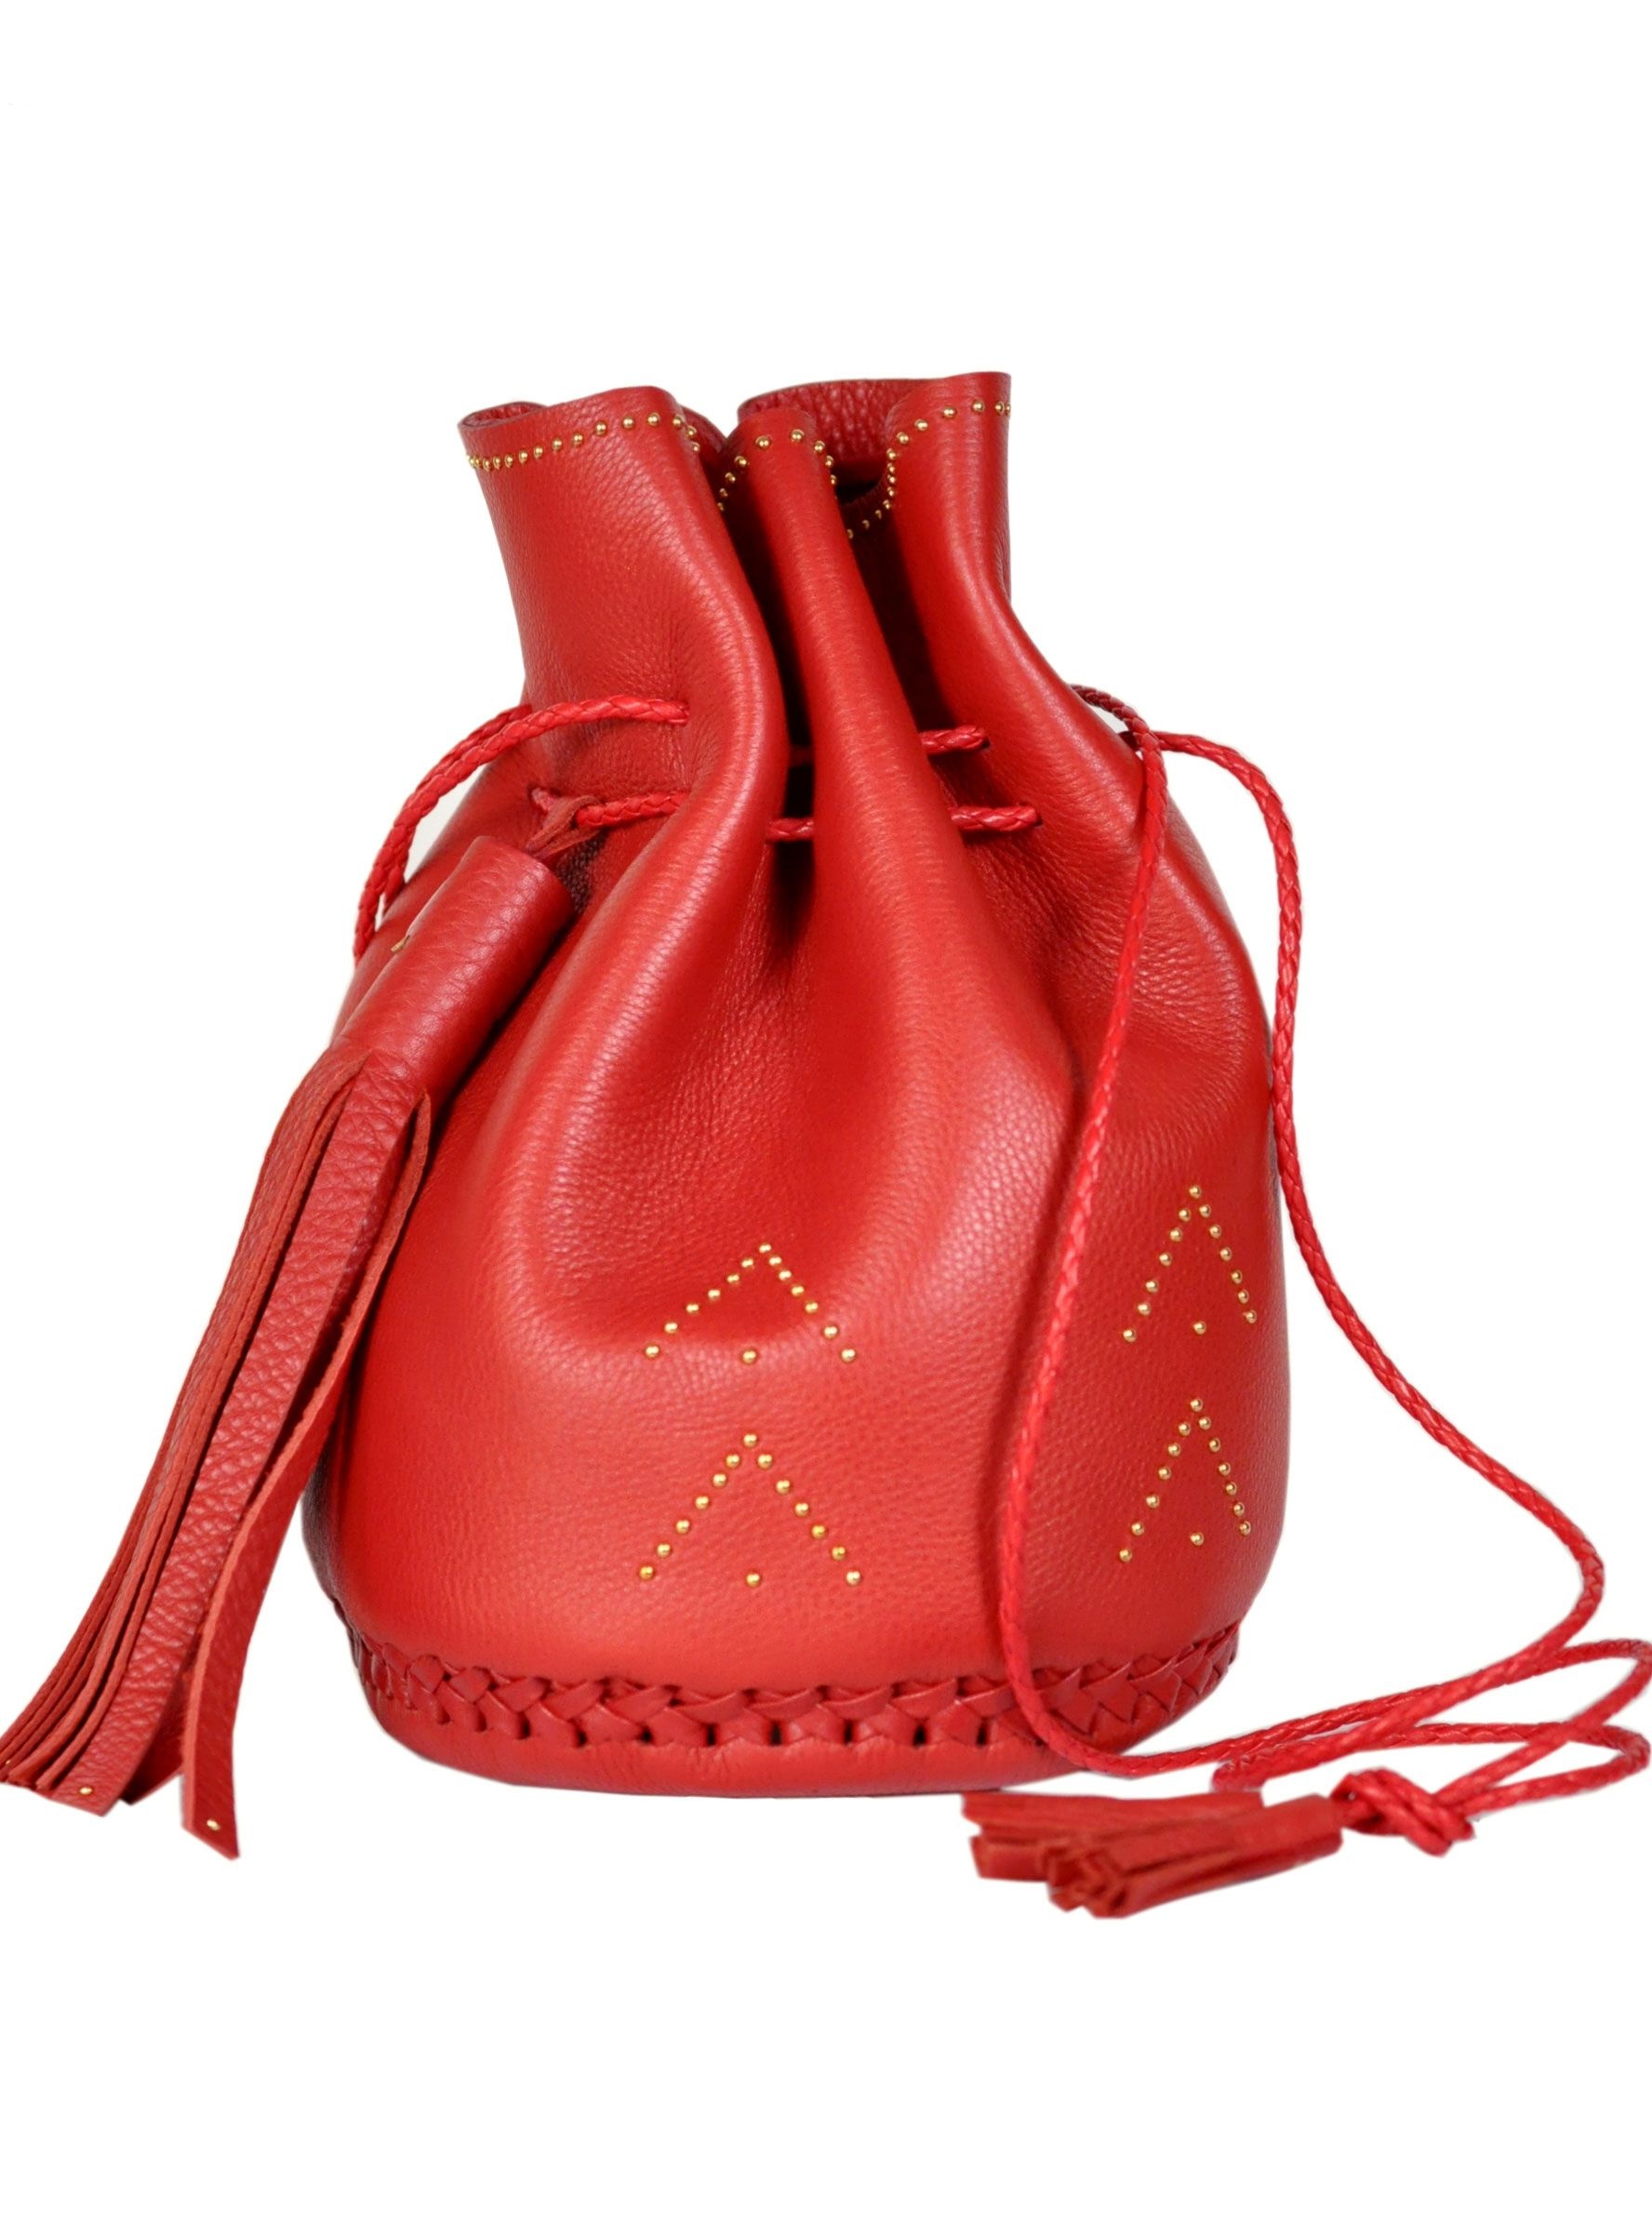 633a6b73e The Wendy Nichol Studded Chevron Bullet Bag | BONADRAG.COM | Bag ...